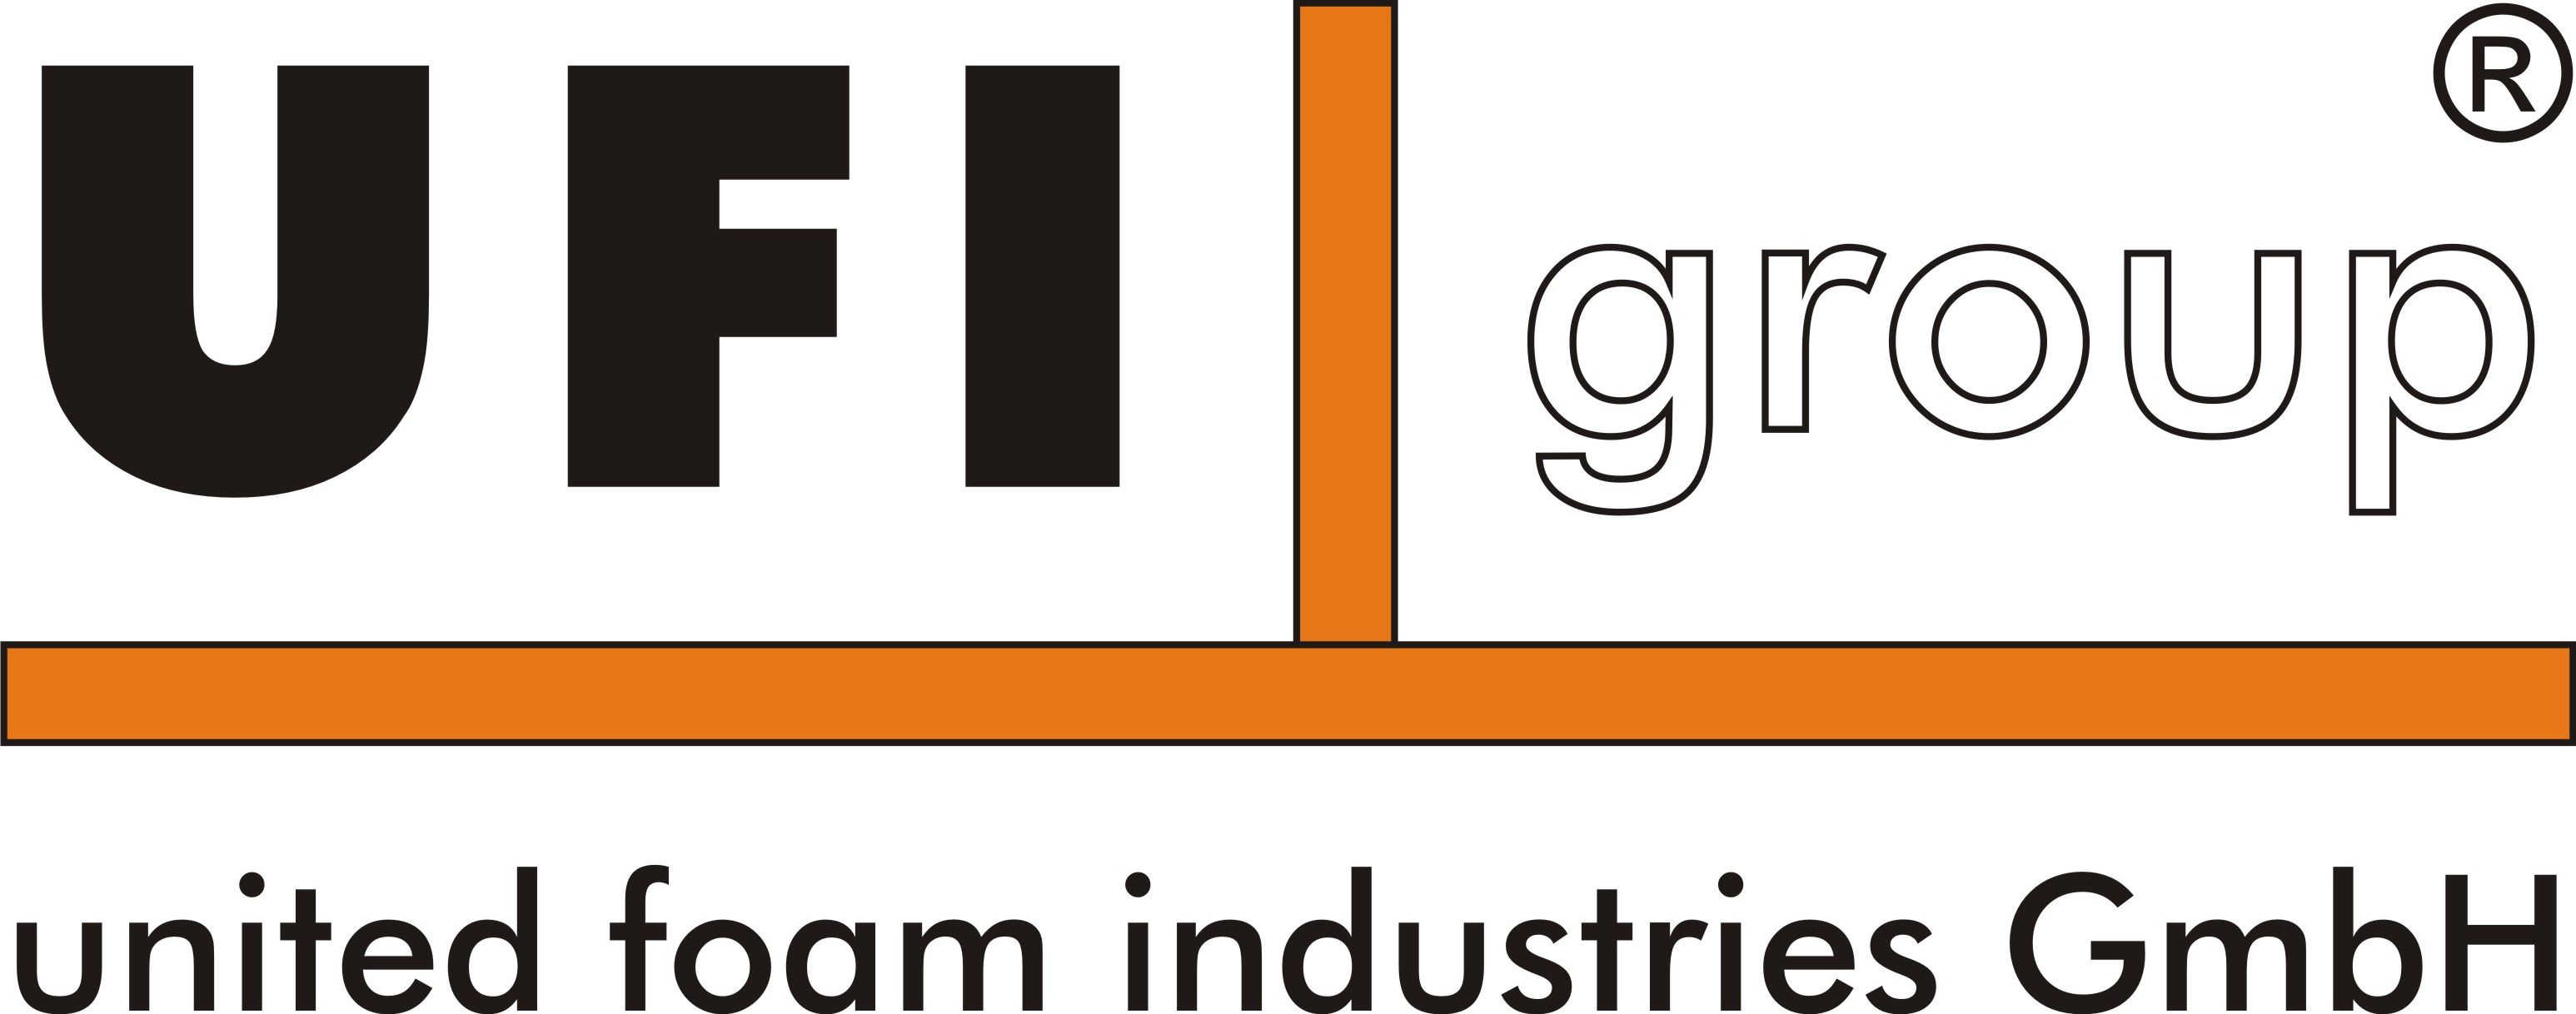 United Foam Industries GmbH